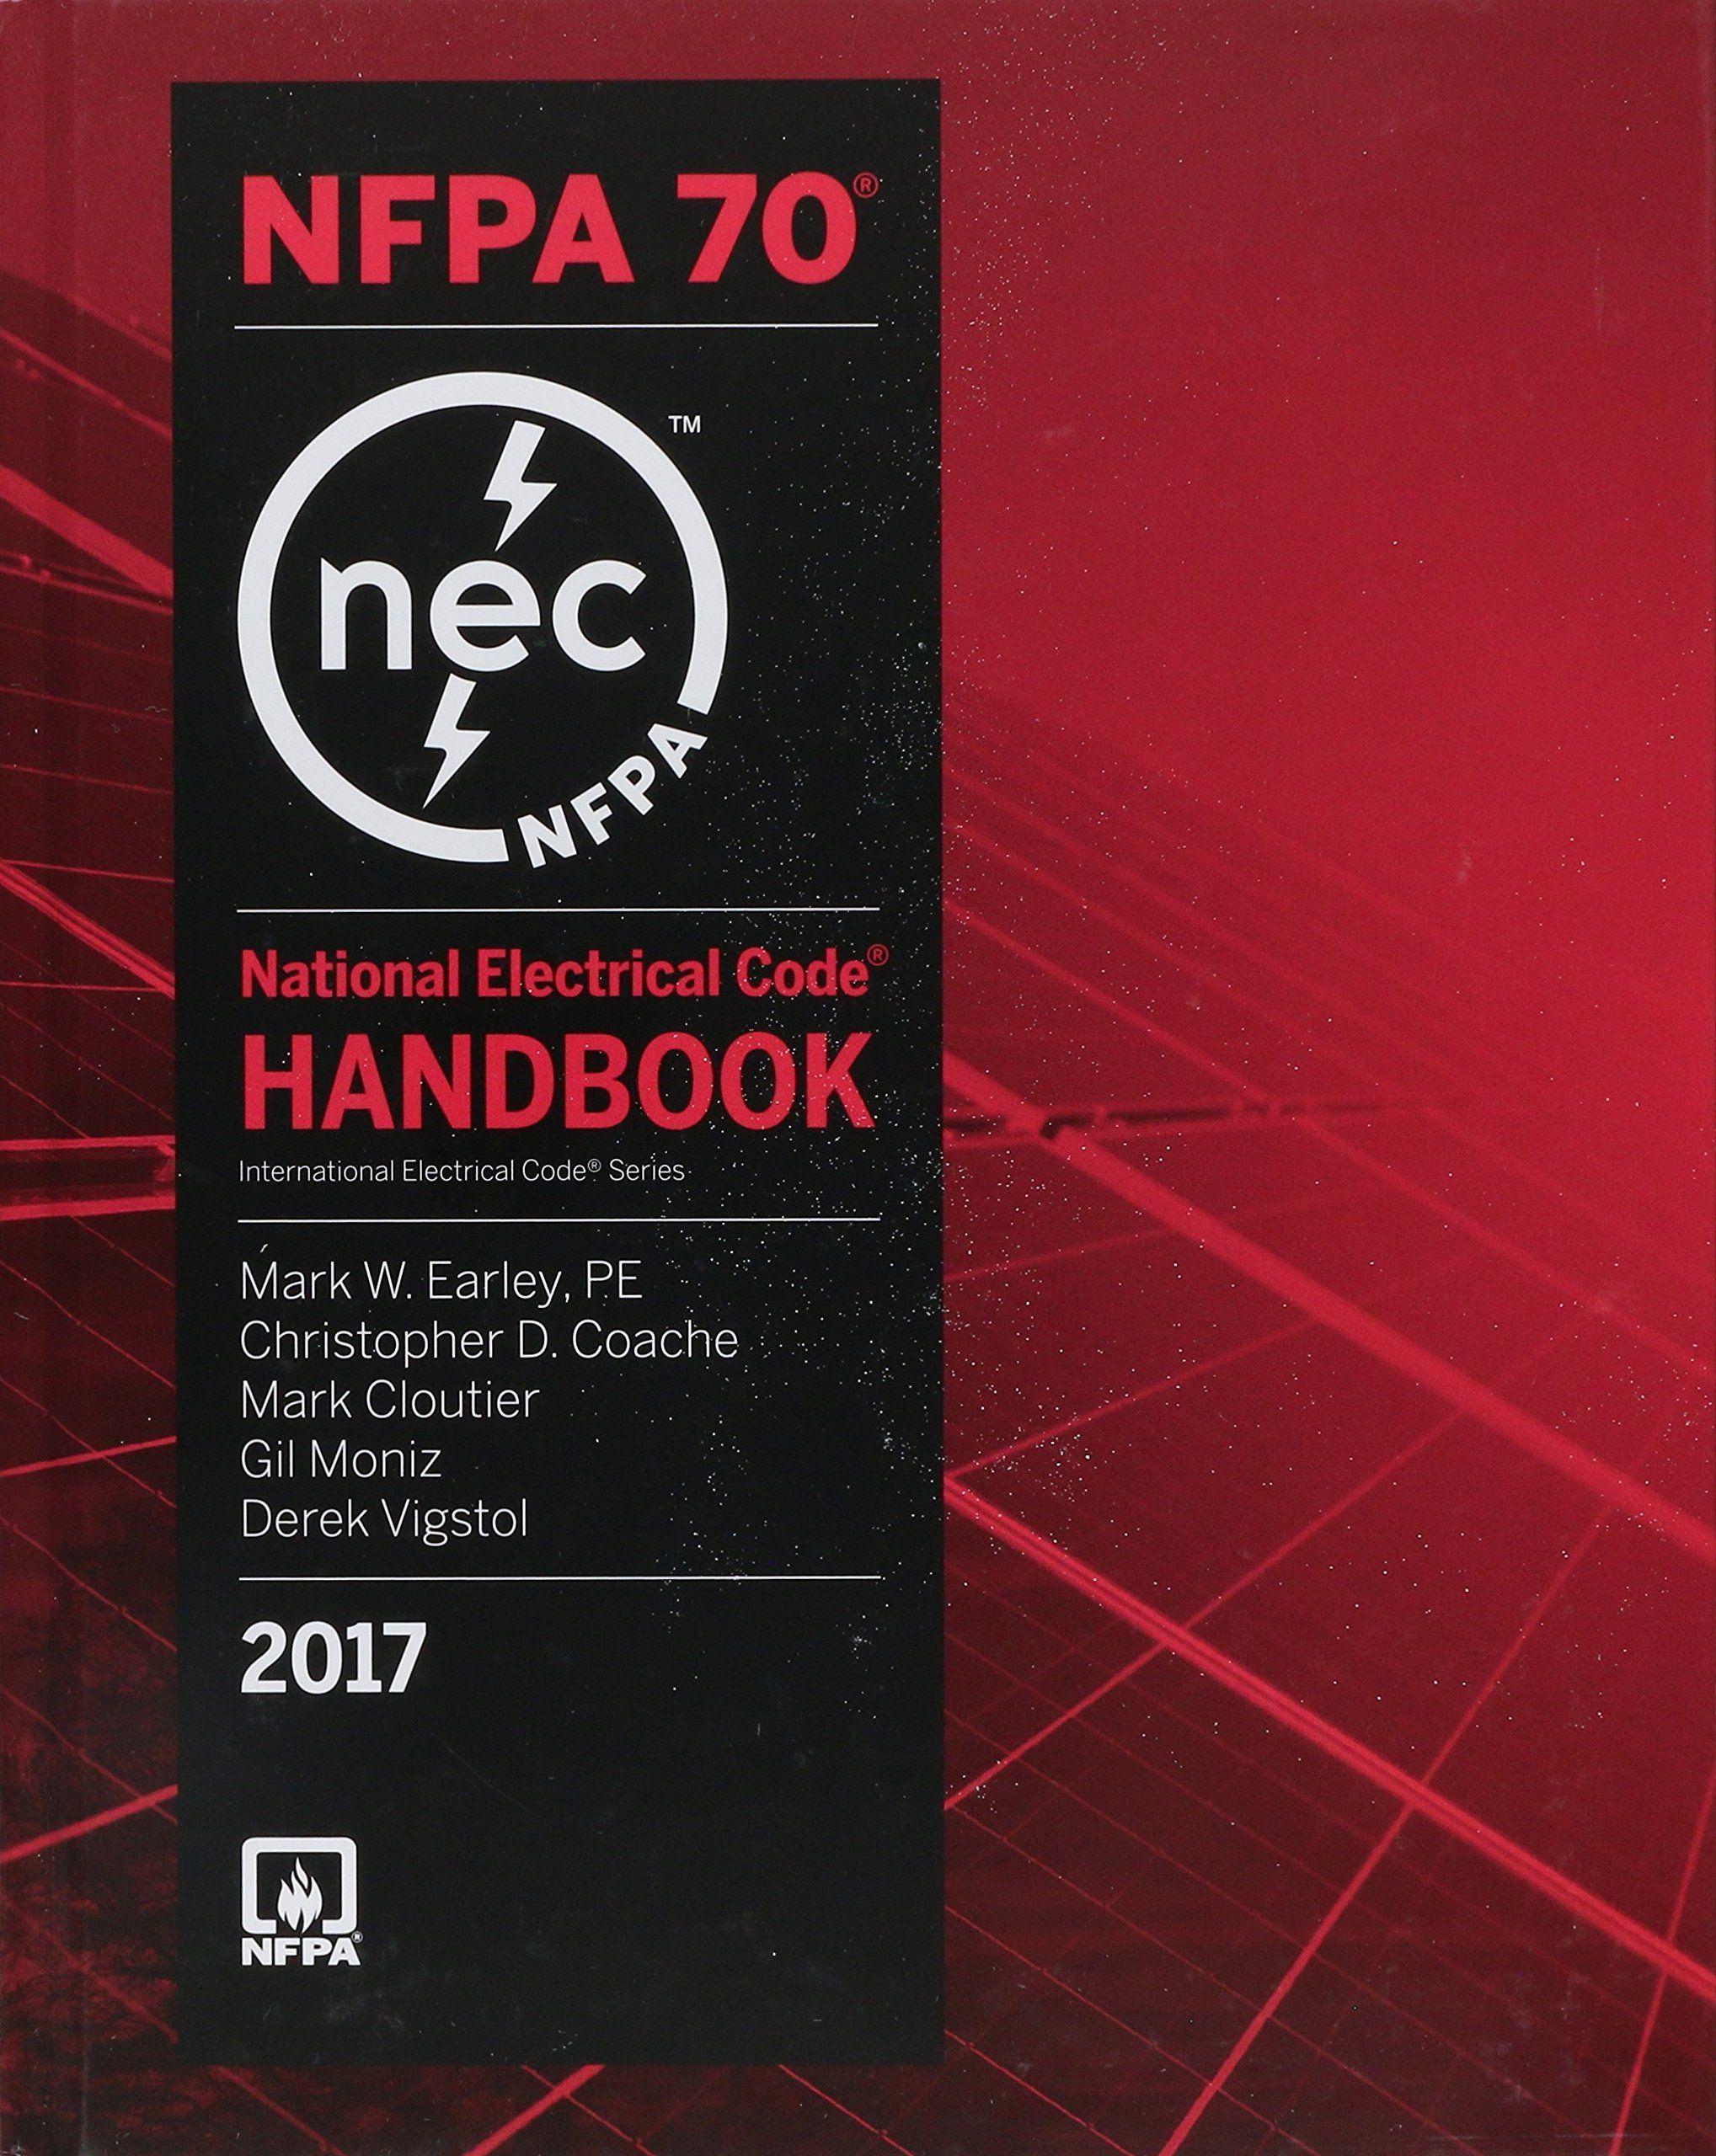 New National Electrical Code 2017 Handbook International Electrical Code Electrical Code Book Electrical Code Free Reading